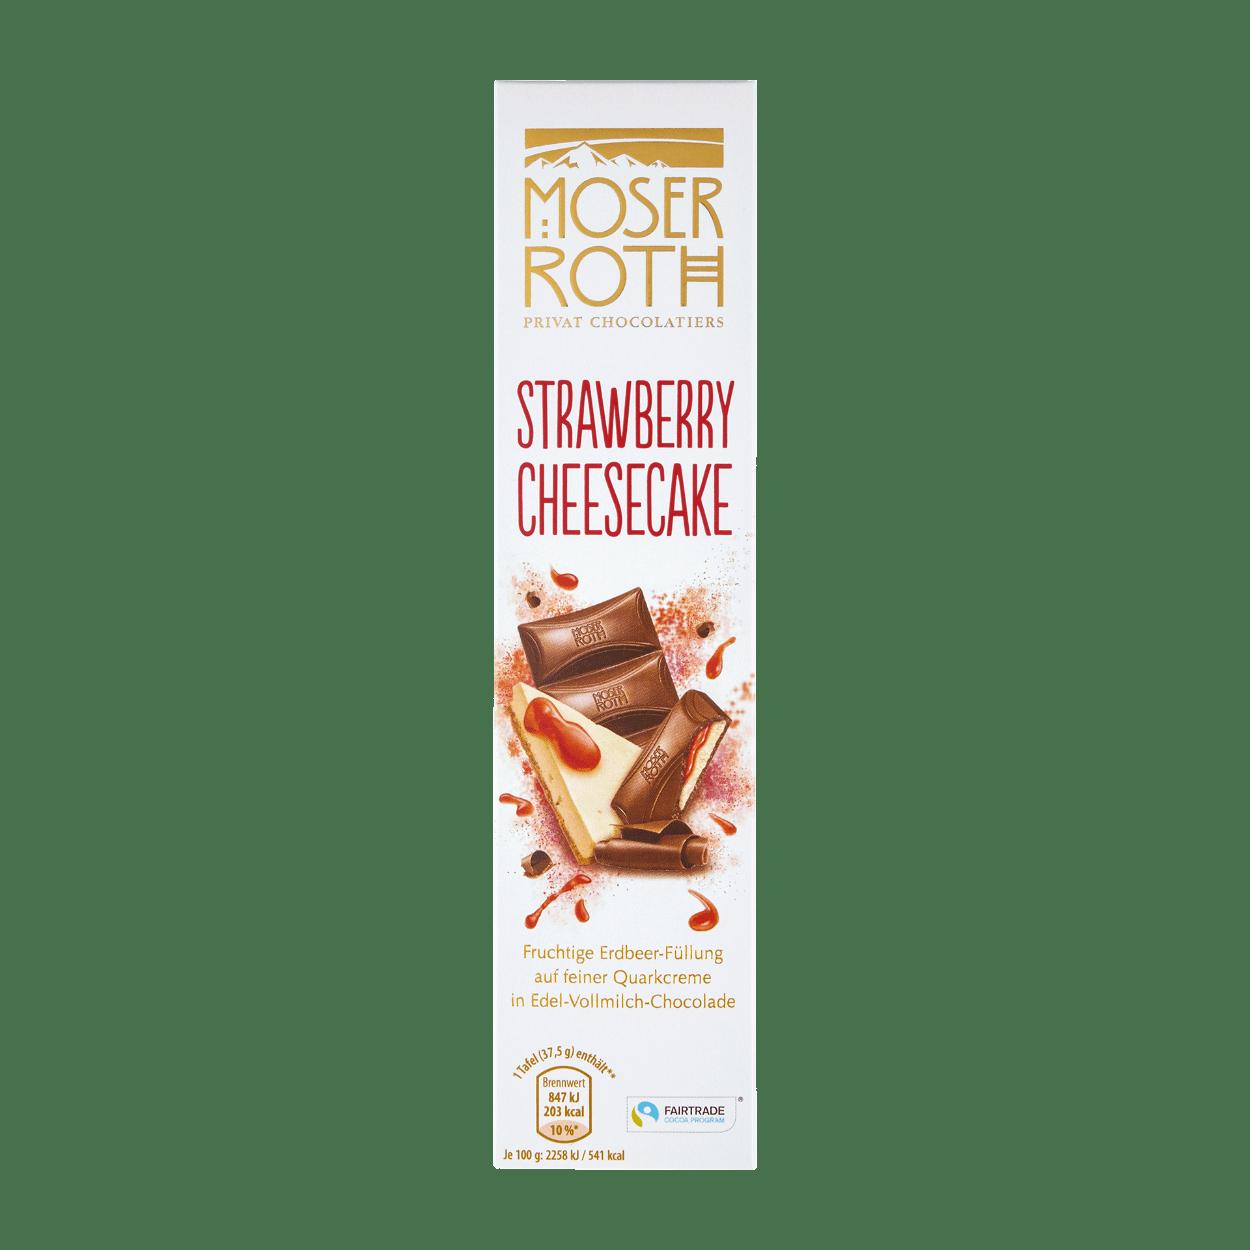 Шоколад Moser Roth strawberry cheesecake, 75 грамм